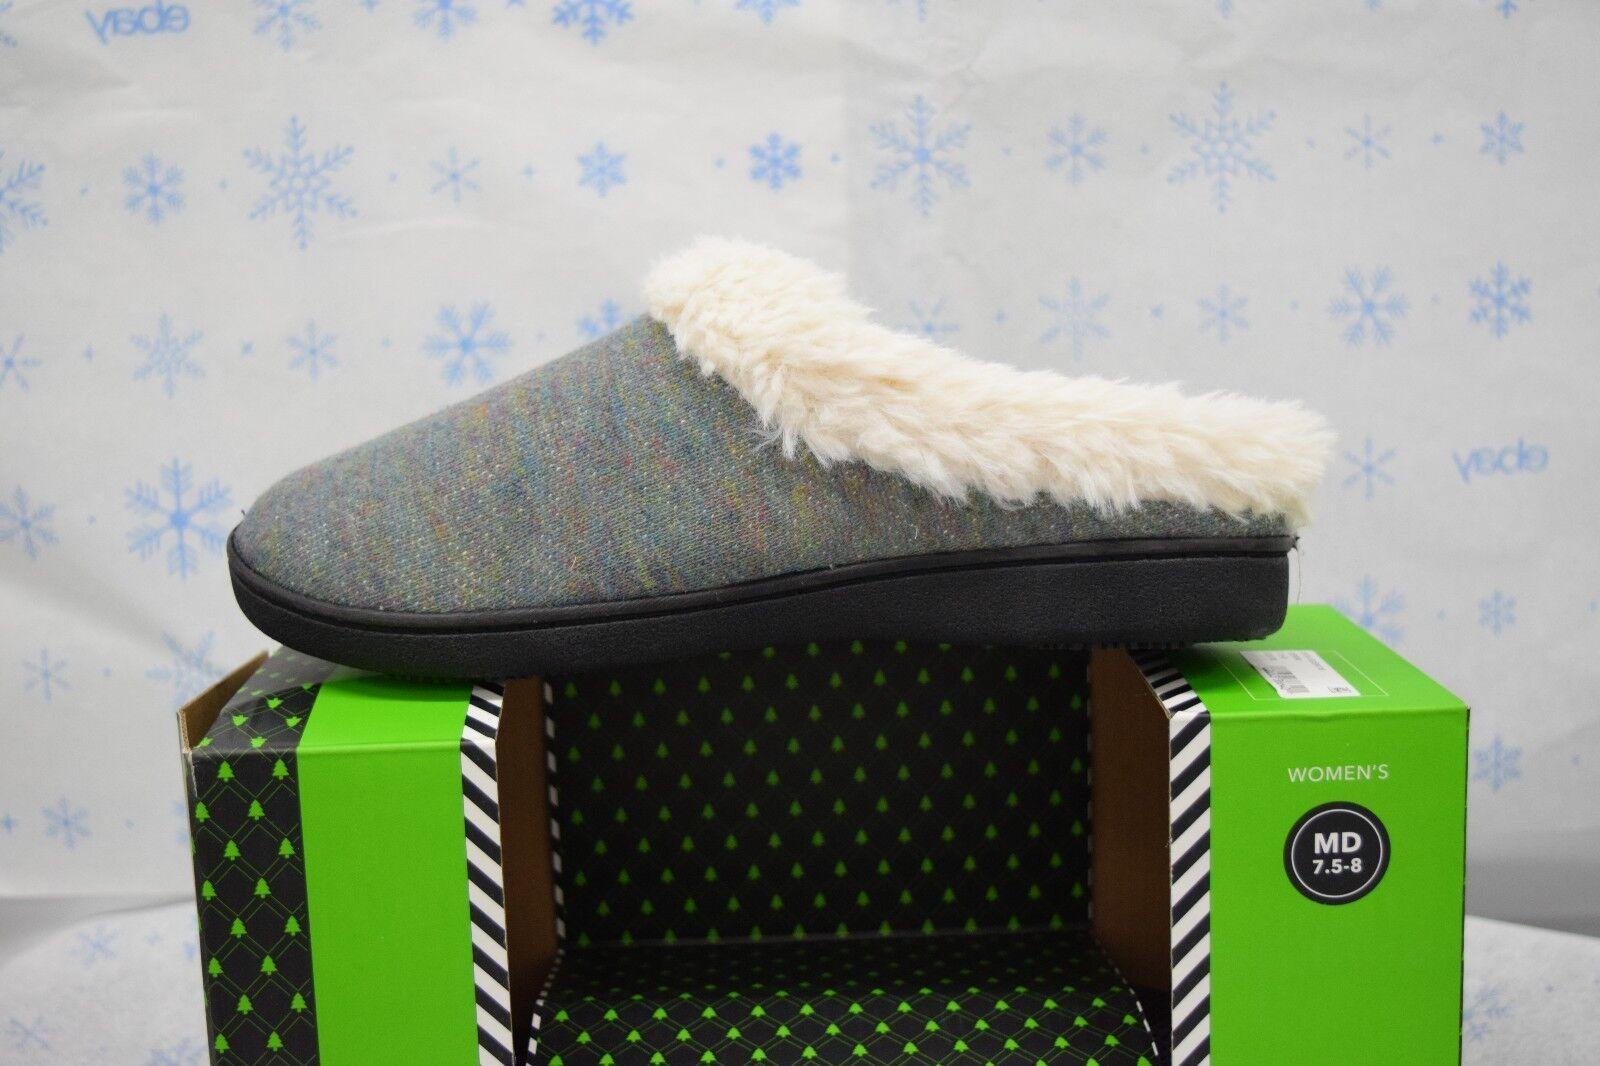 ISOTONER SLIPPERS 7.5-8 Medium Denim WOODLANDS Heel Cushion Fleece